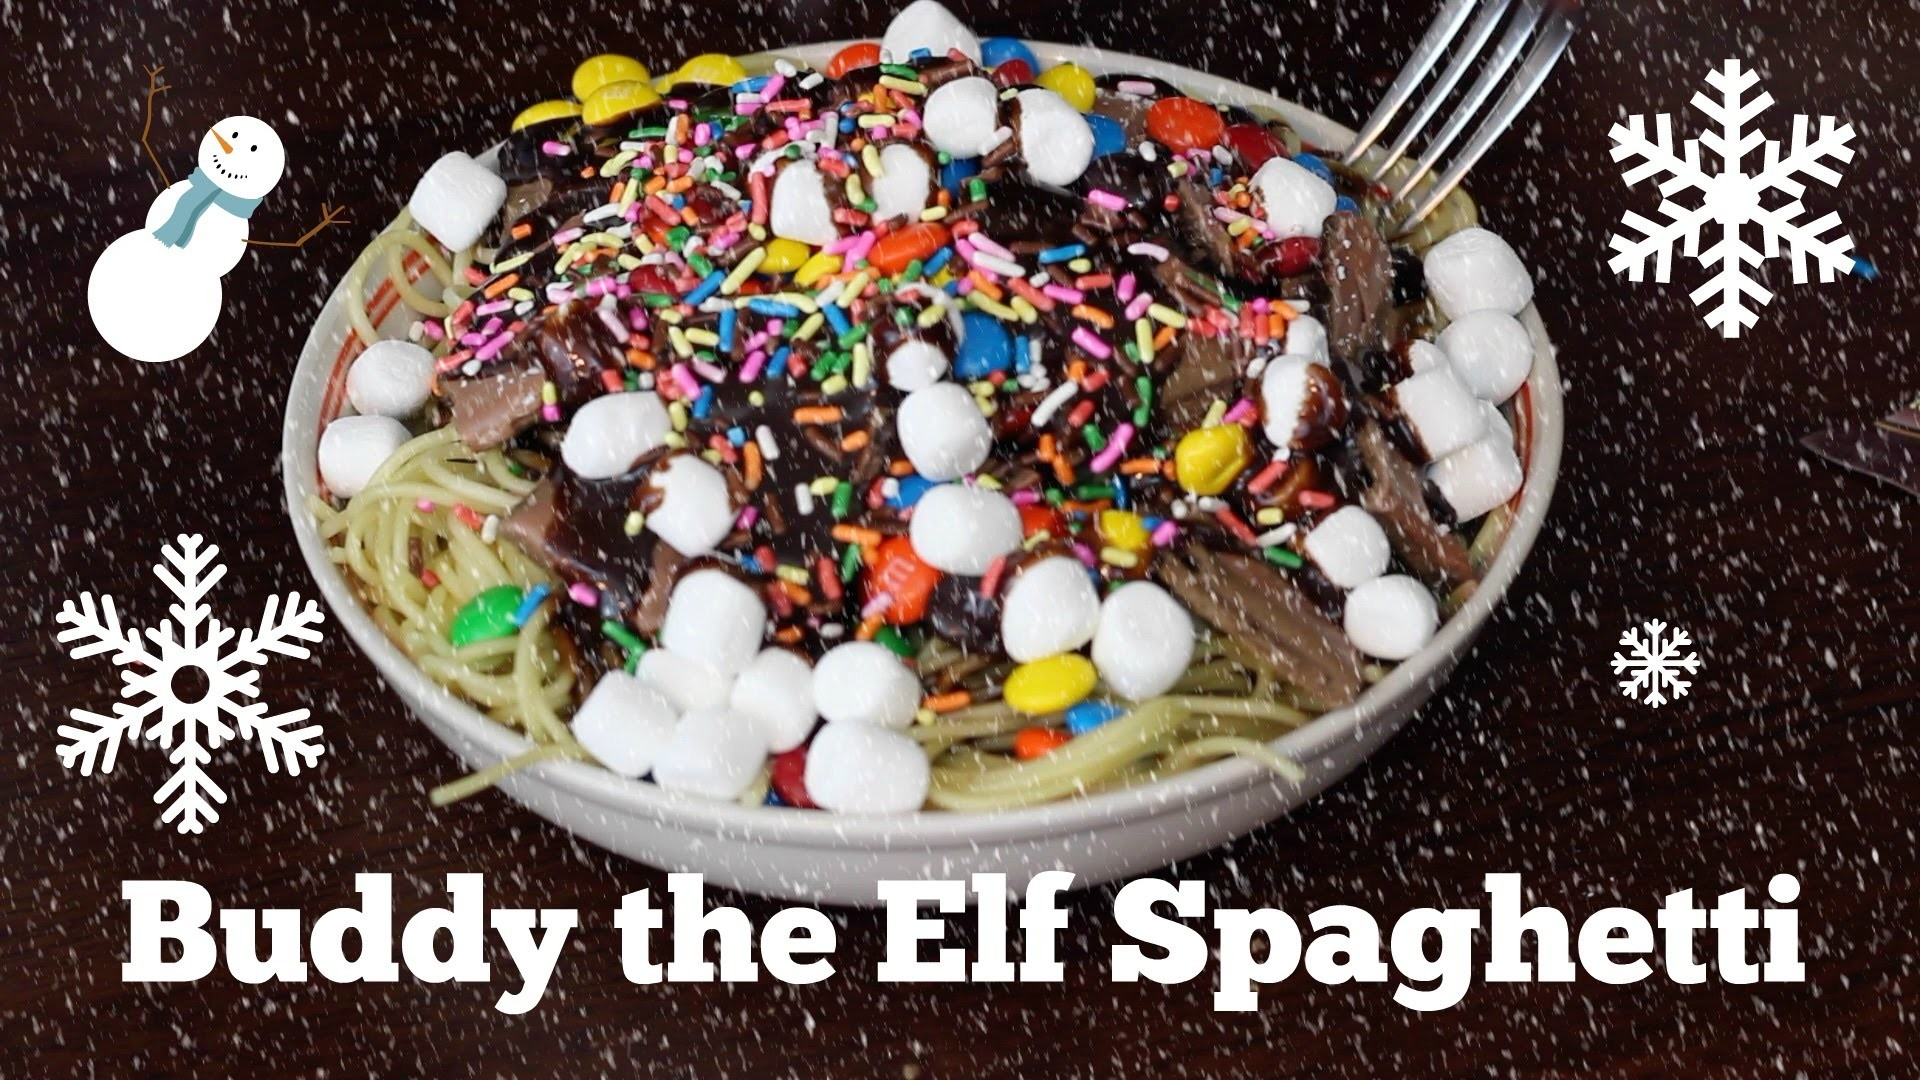 Buddy the Elf's Spaghetti challenge